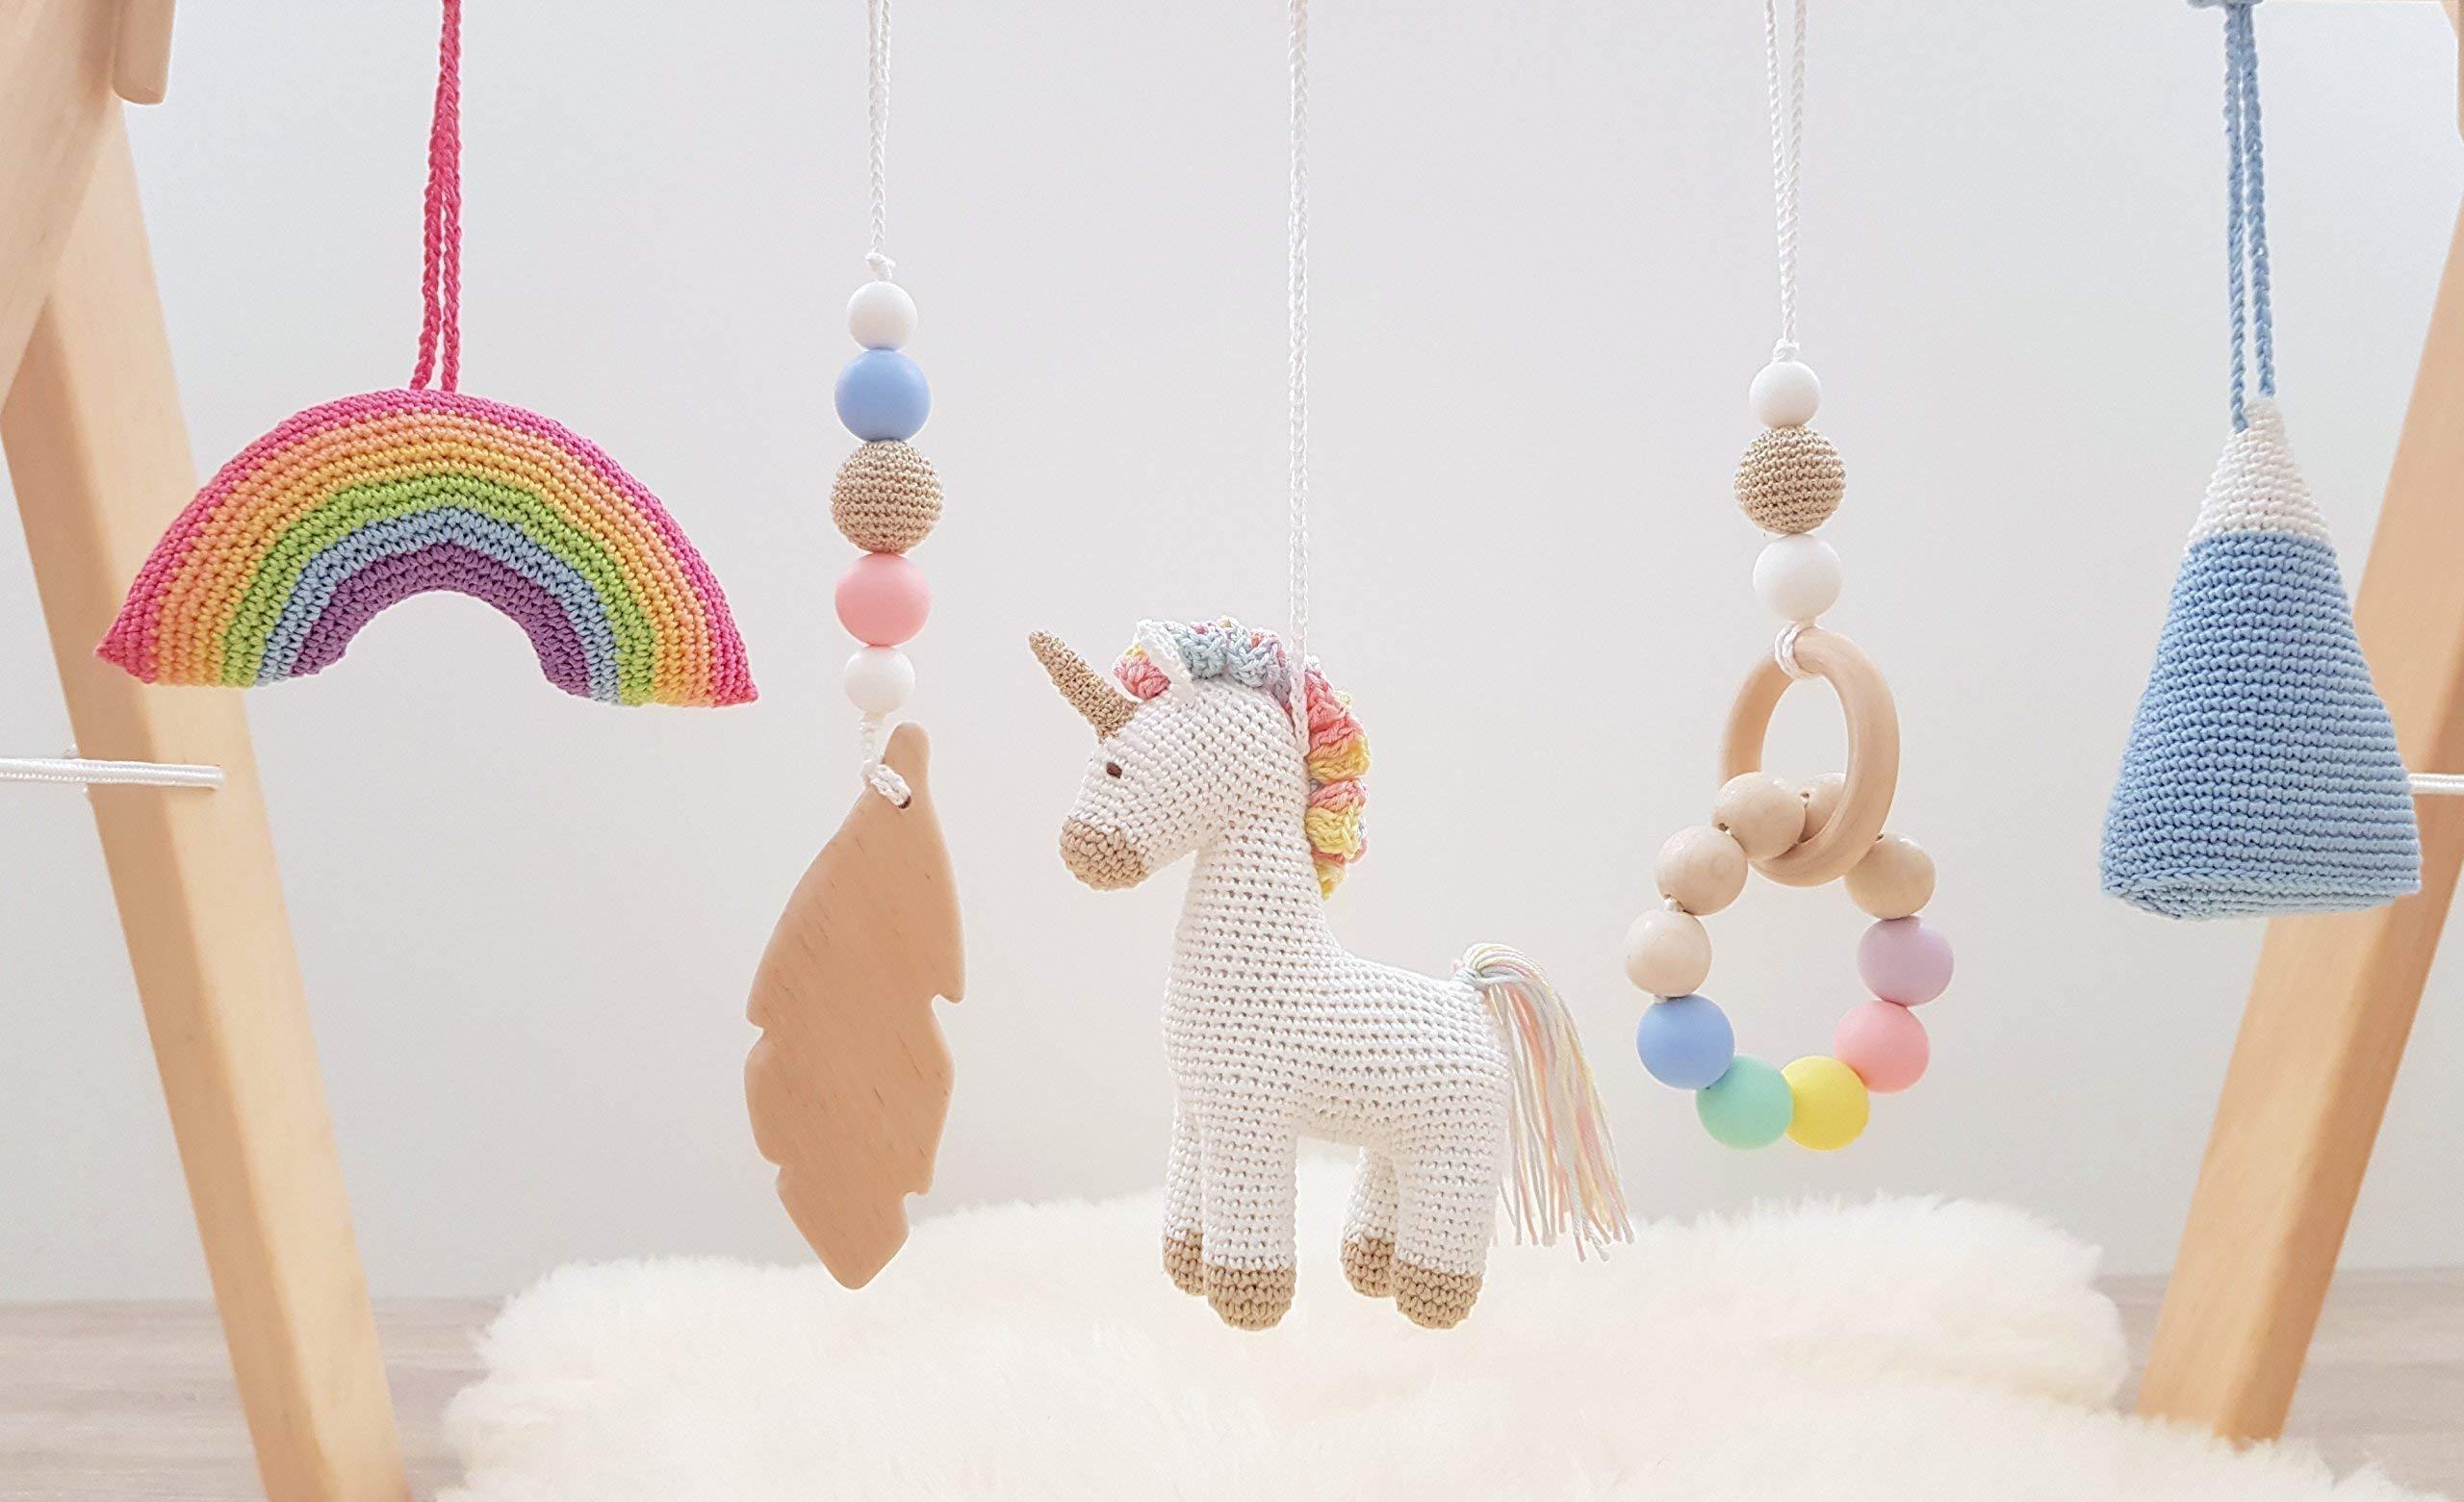 Rainbow Unicorn Baby Play Gym with 5 Mobiles: Unicorn, Rainbow, Mountain, Feather, Beaded Ring. Handmade by… 5